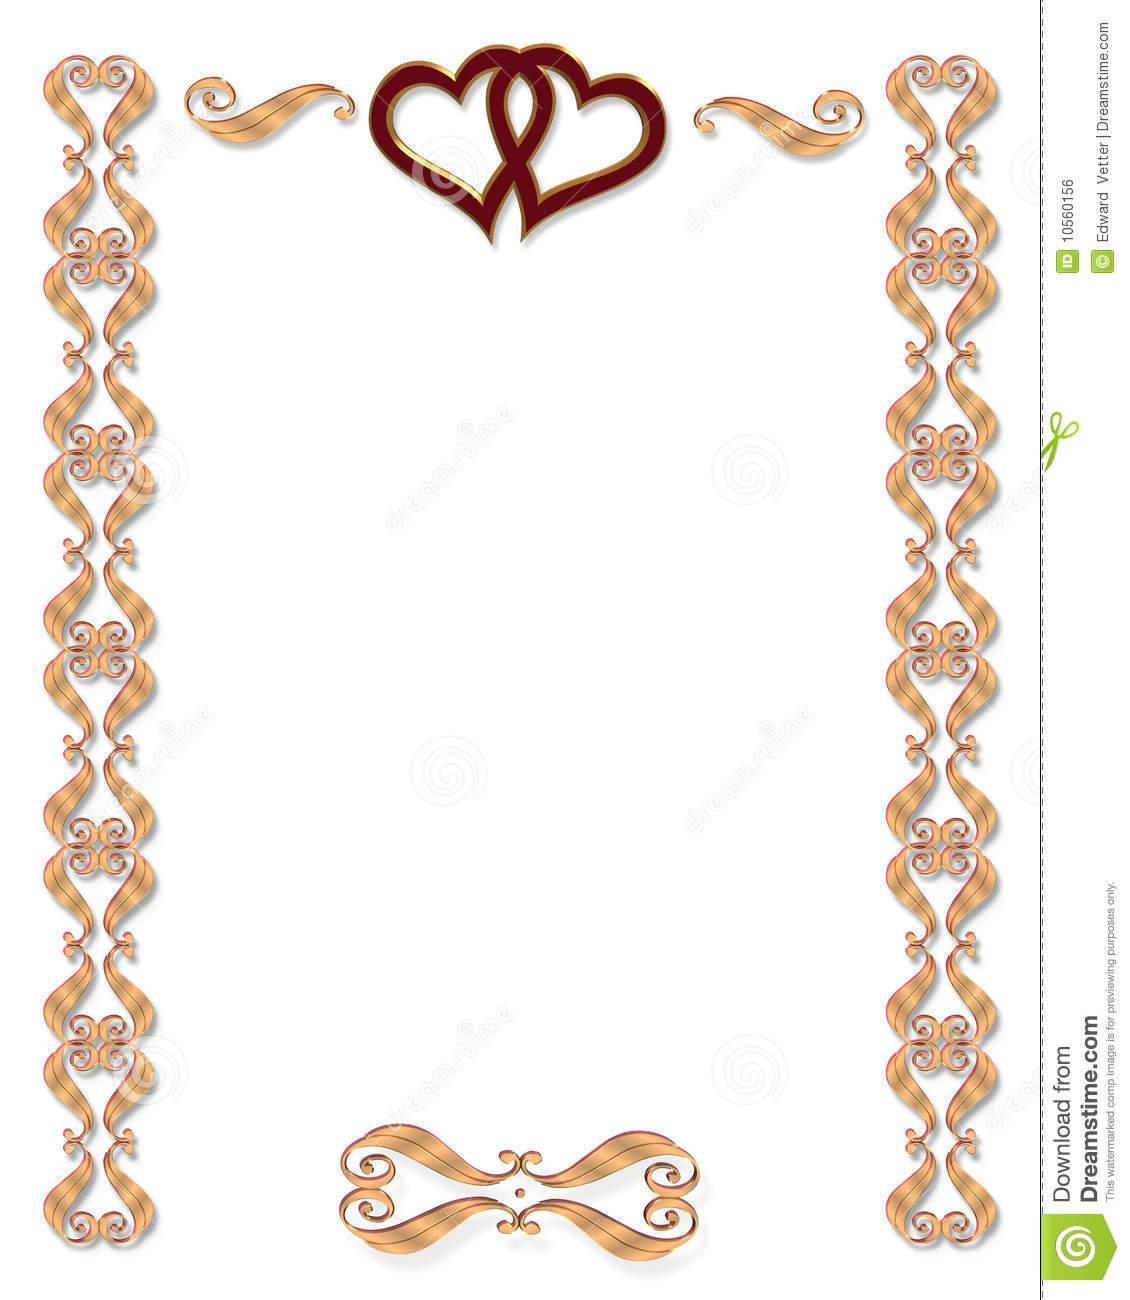 1130x1300 Border For Wedding Invitation Clip Art Choice Image